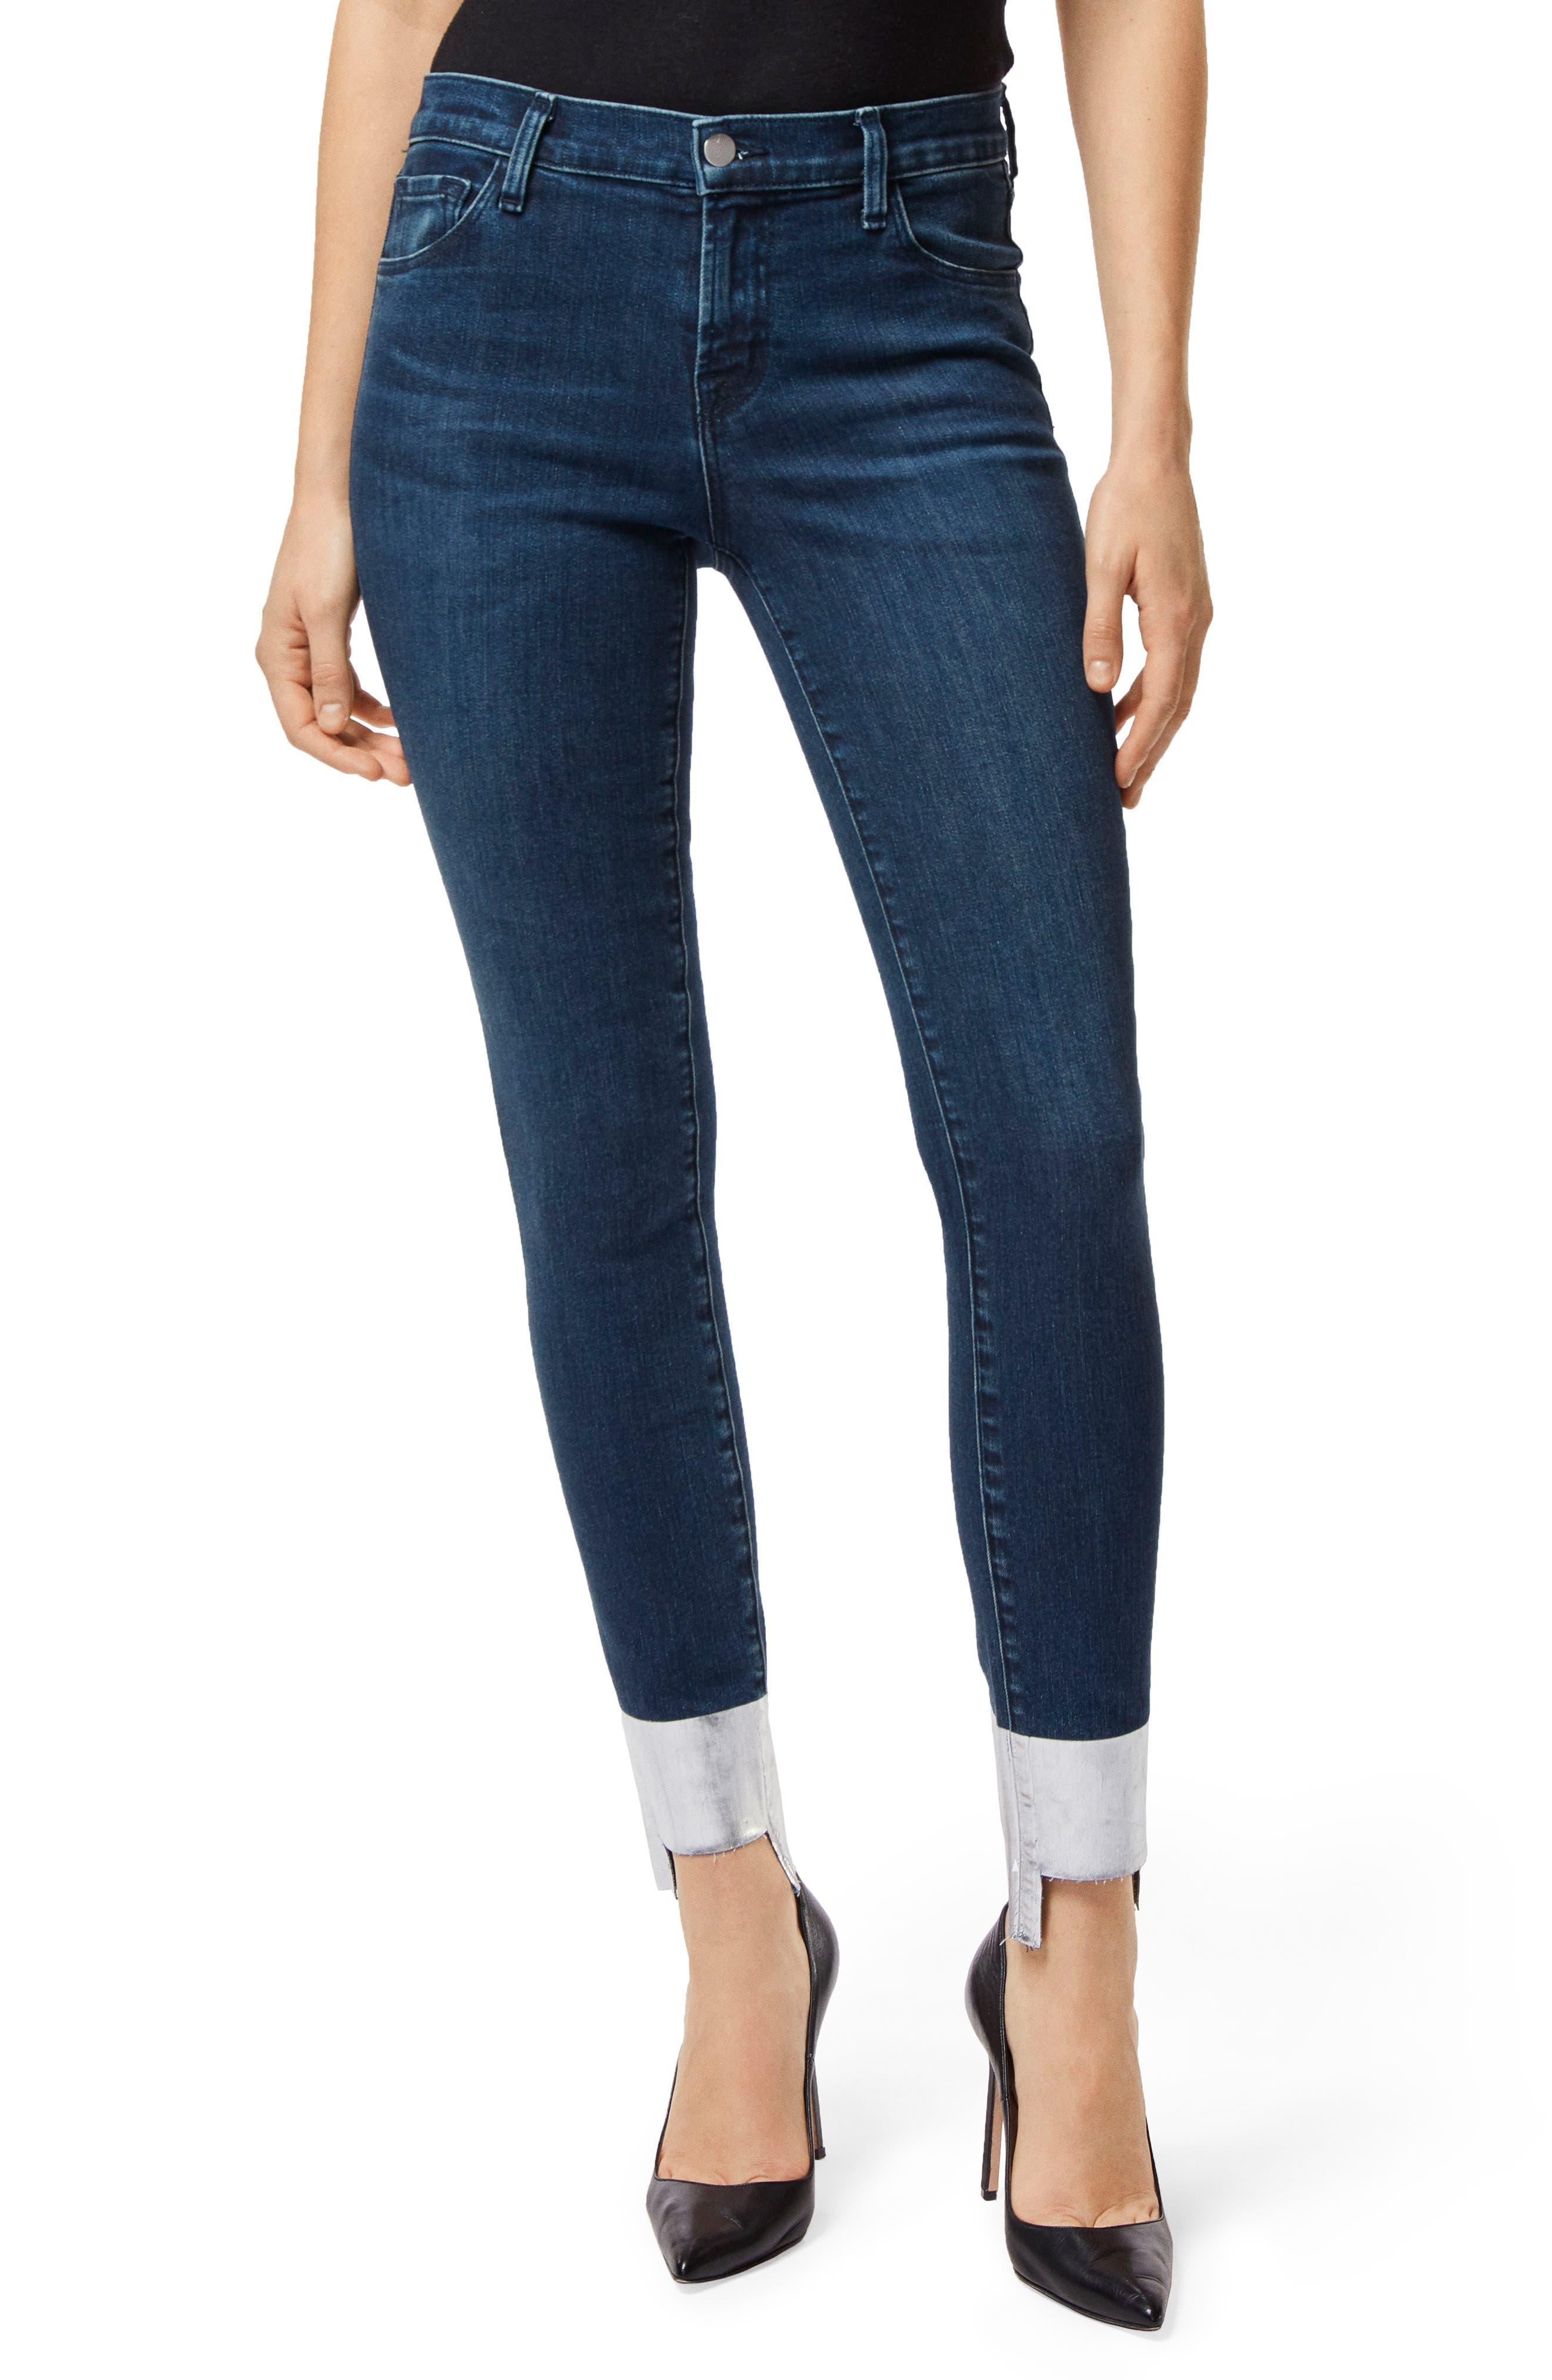 '811' Cutoff Step Hem Skinny Jeans,                         Main,                         color, SILVER POOL